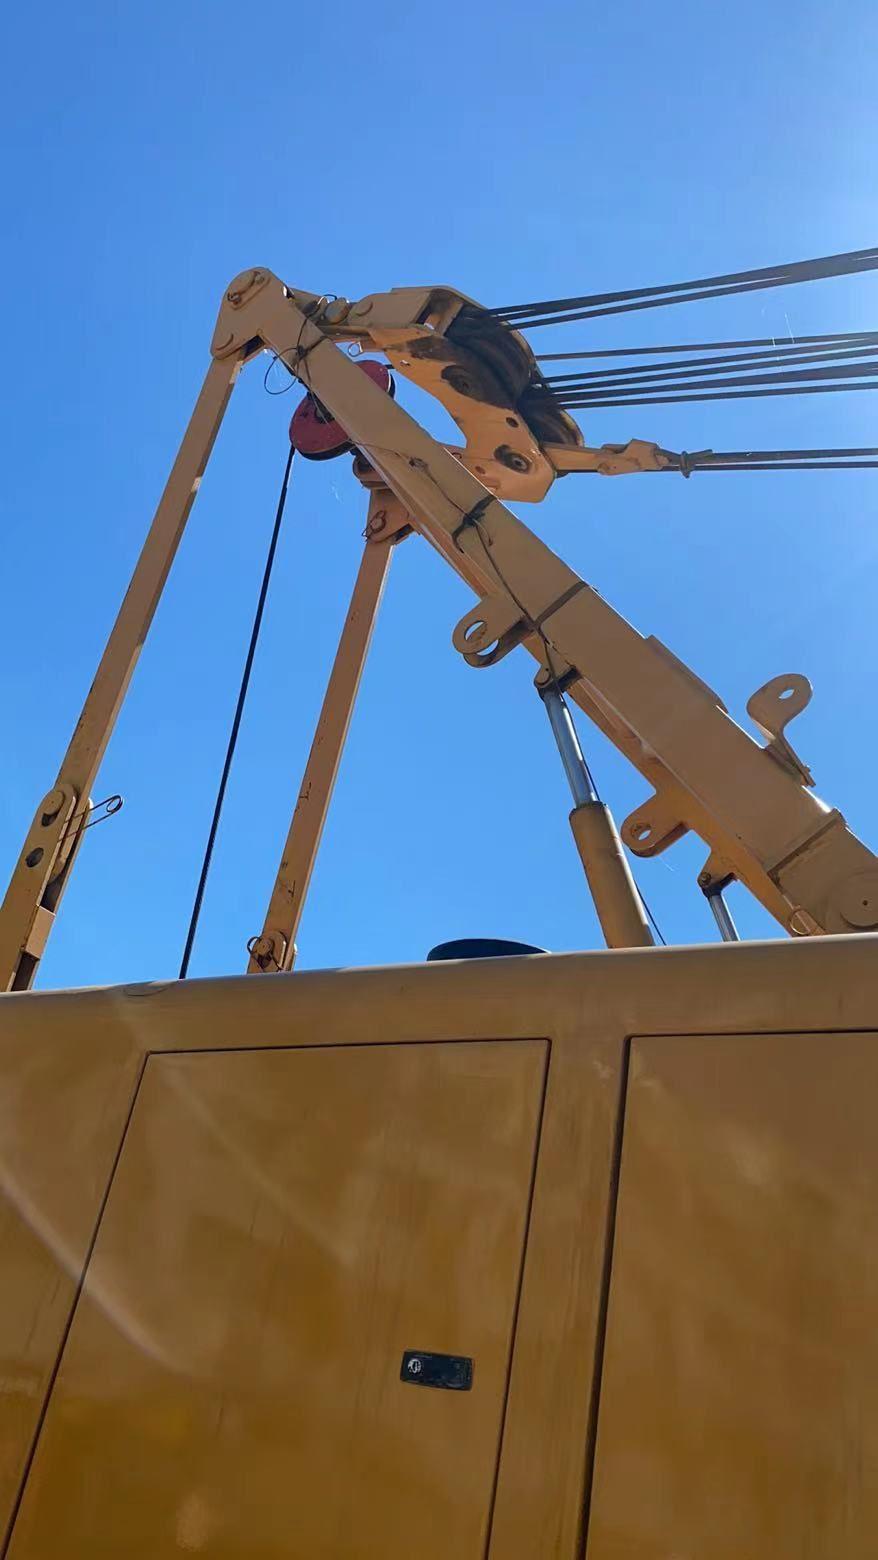 [转让] 徐工 QUY80A 80吨